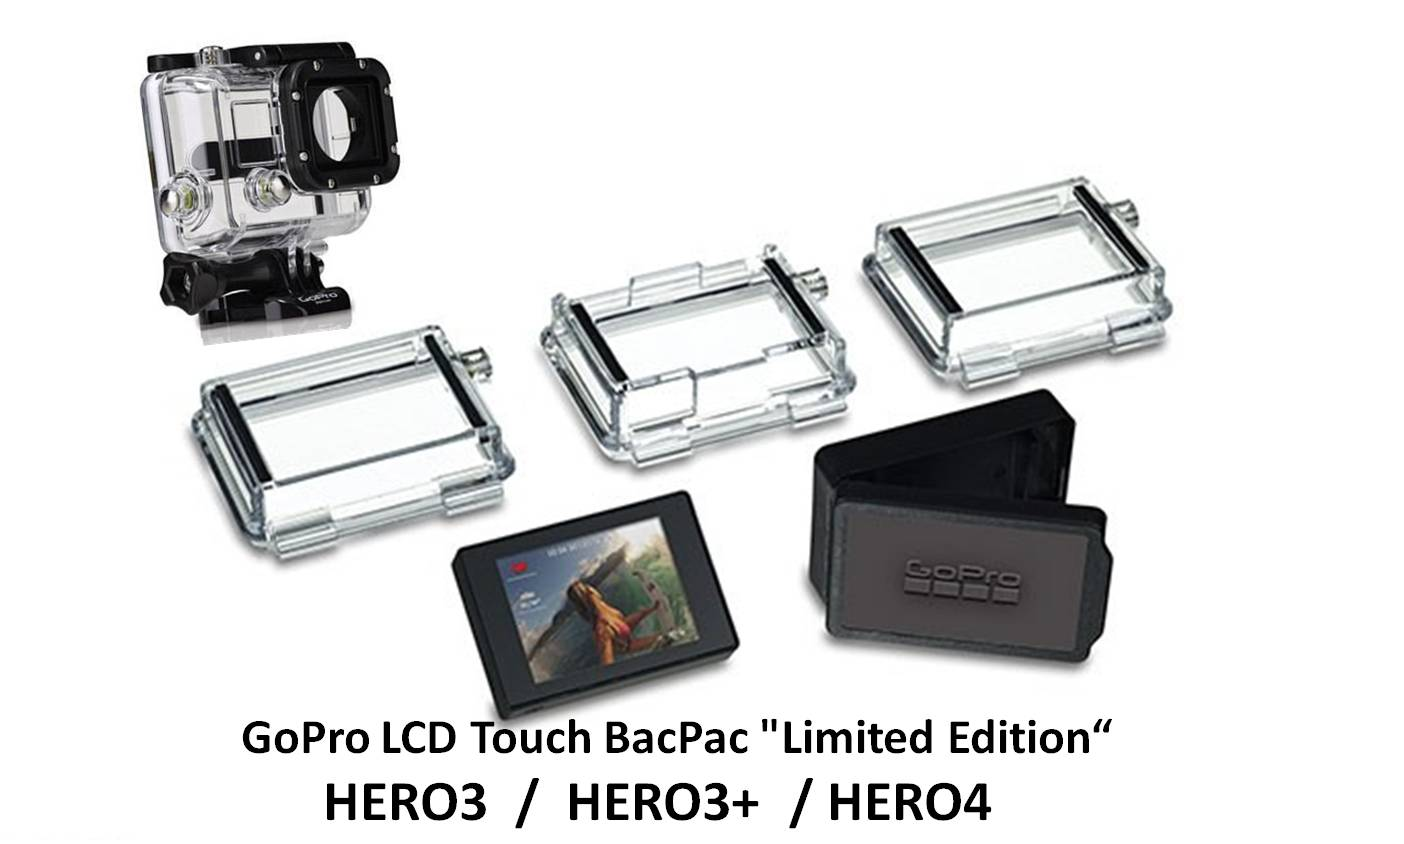 Комплектация LCD Touch BacPac Limited Edition для камеры GoPro HERO3+ / HERO4